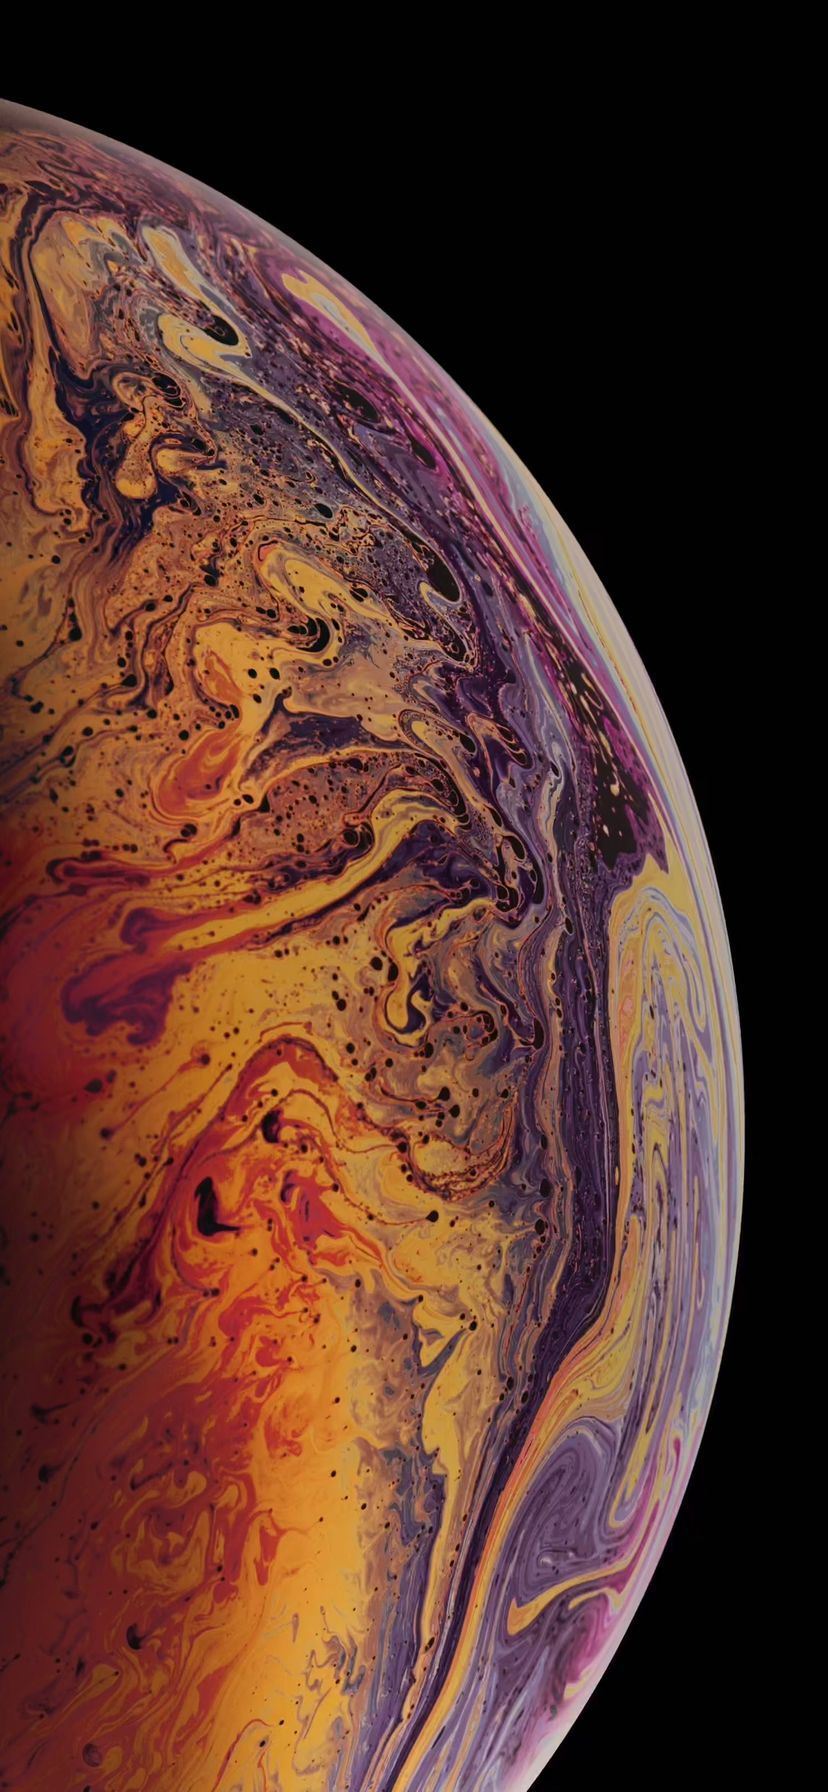 Visit Now Free Download Iphone 11 Wallpaper Full Hd Wallpaper